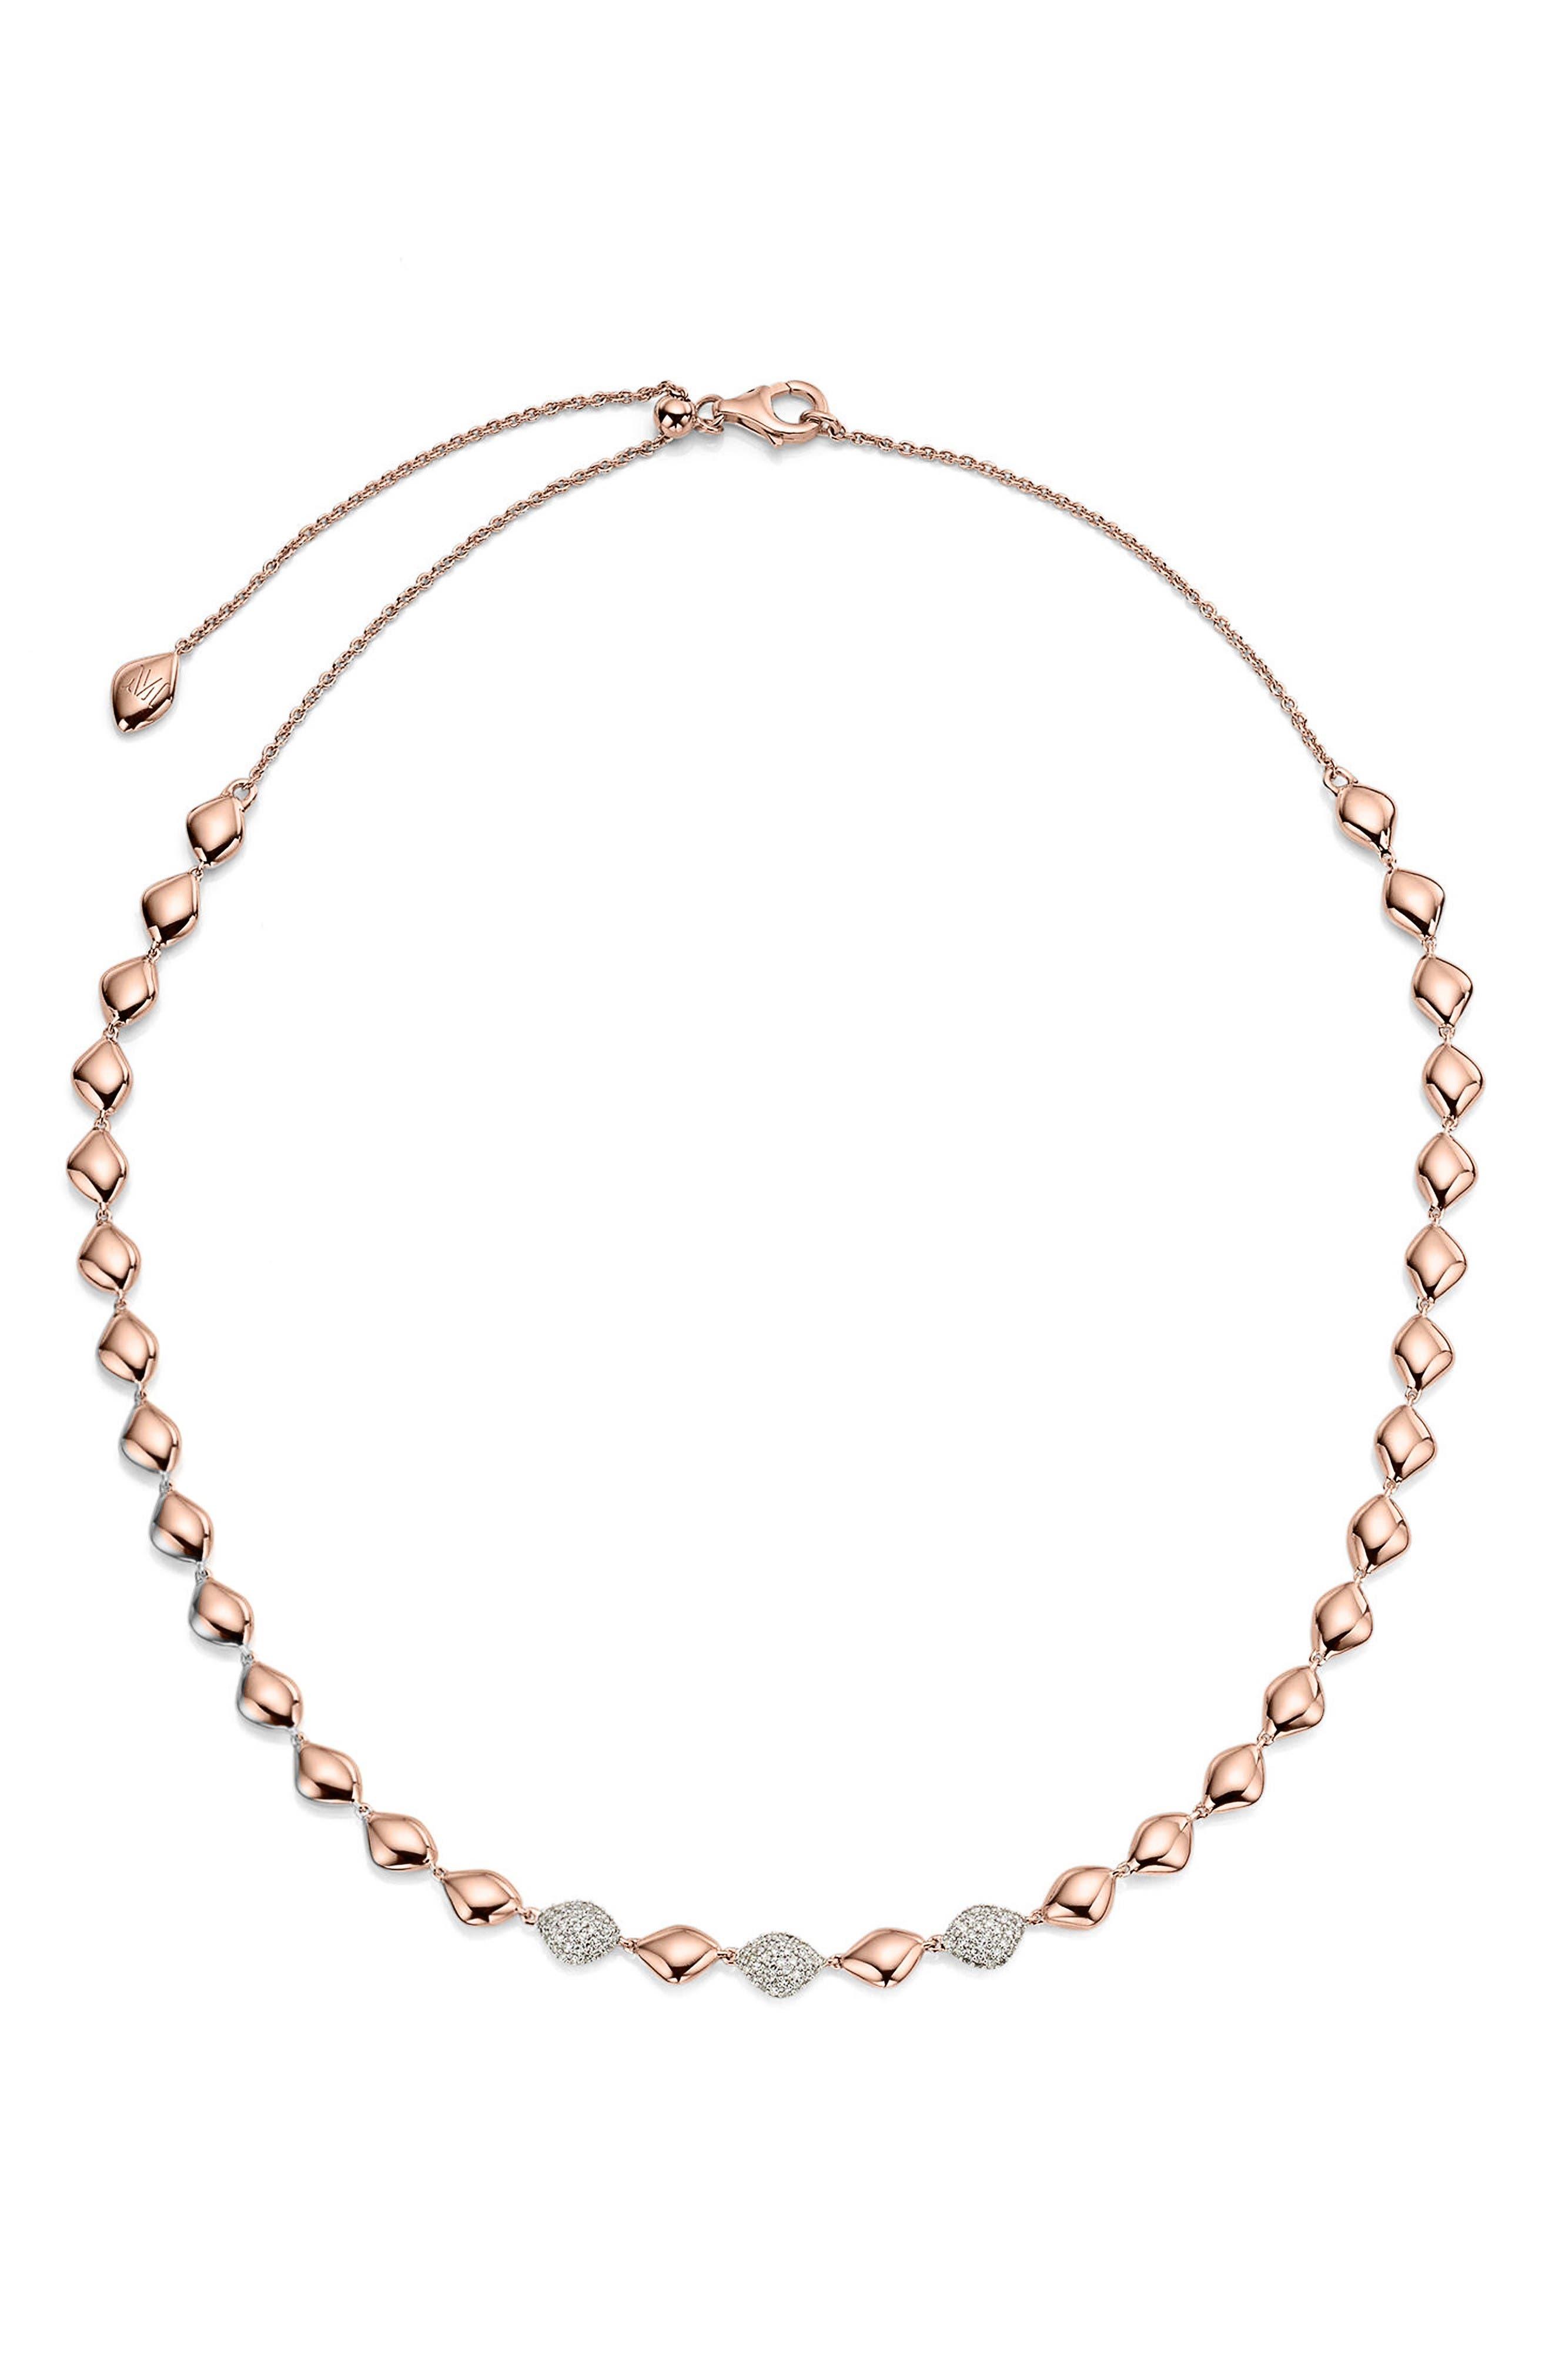 Nura Diamond Collar Necklace,                             Main thumbnail 1, color,                             Rose Gold/ Diamond